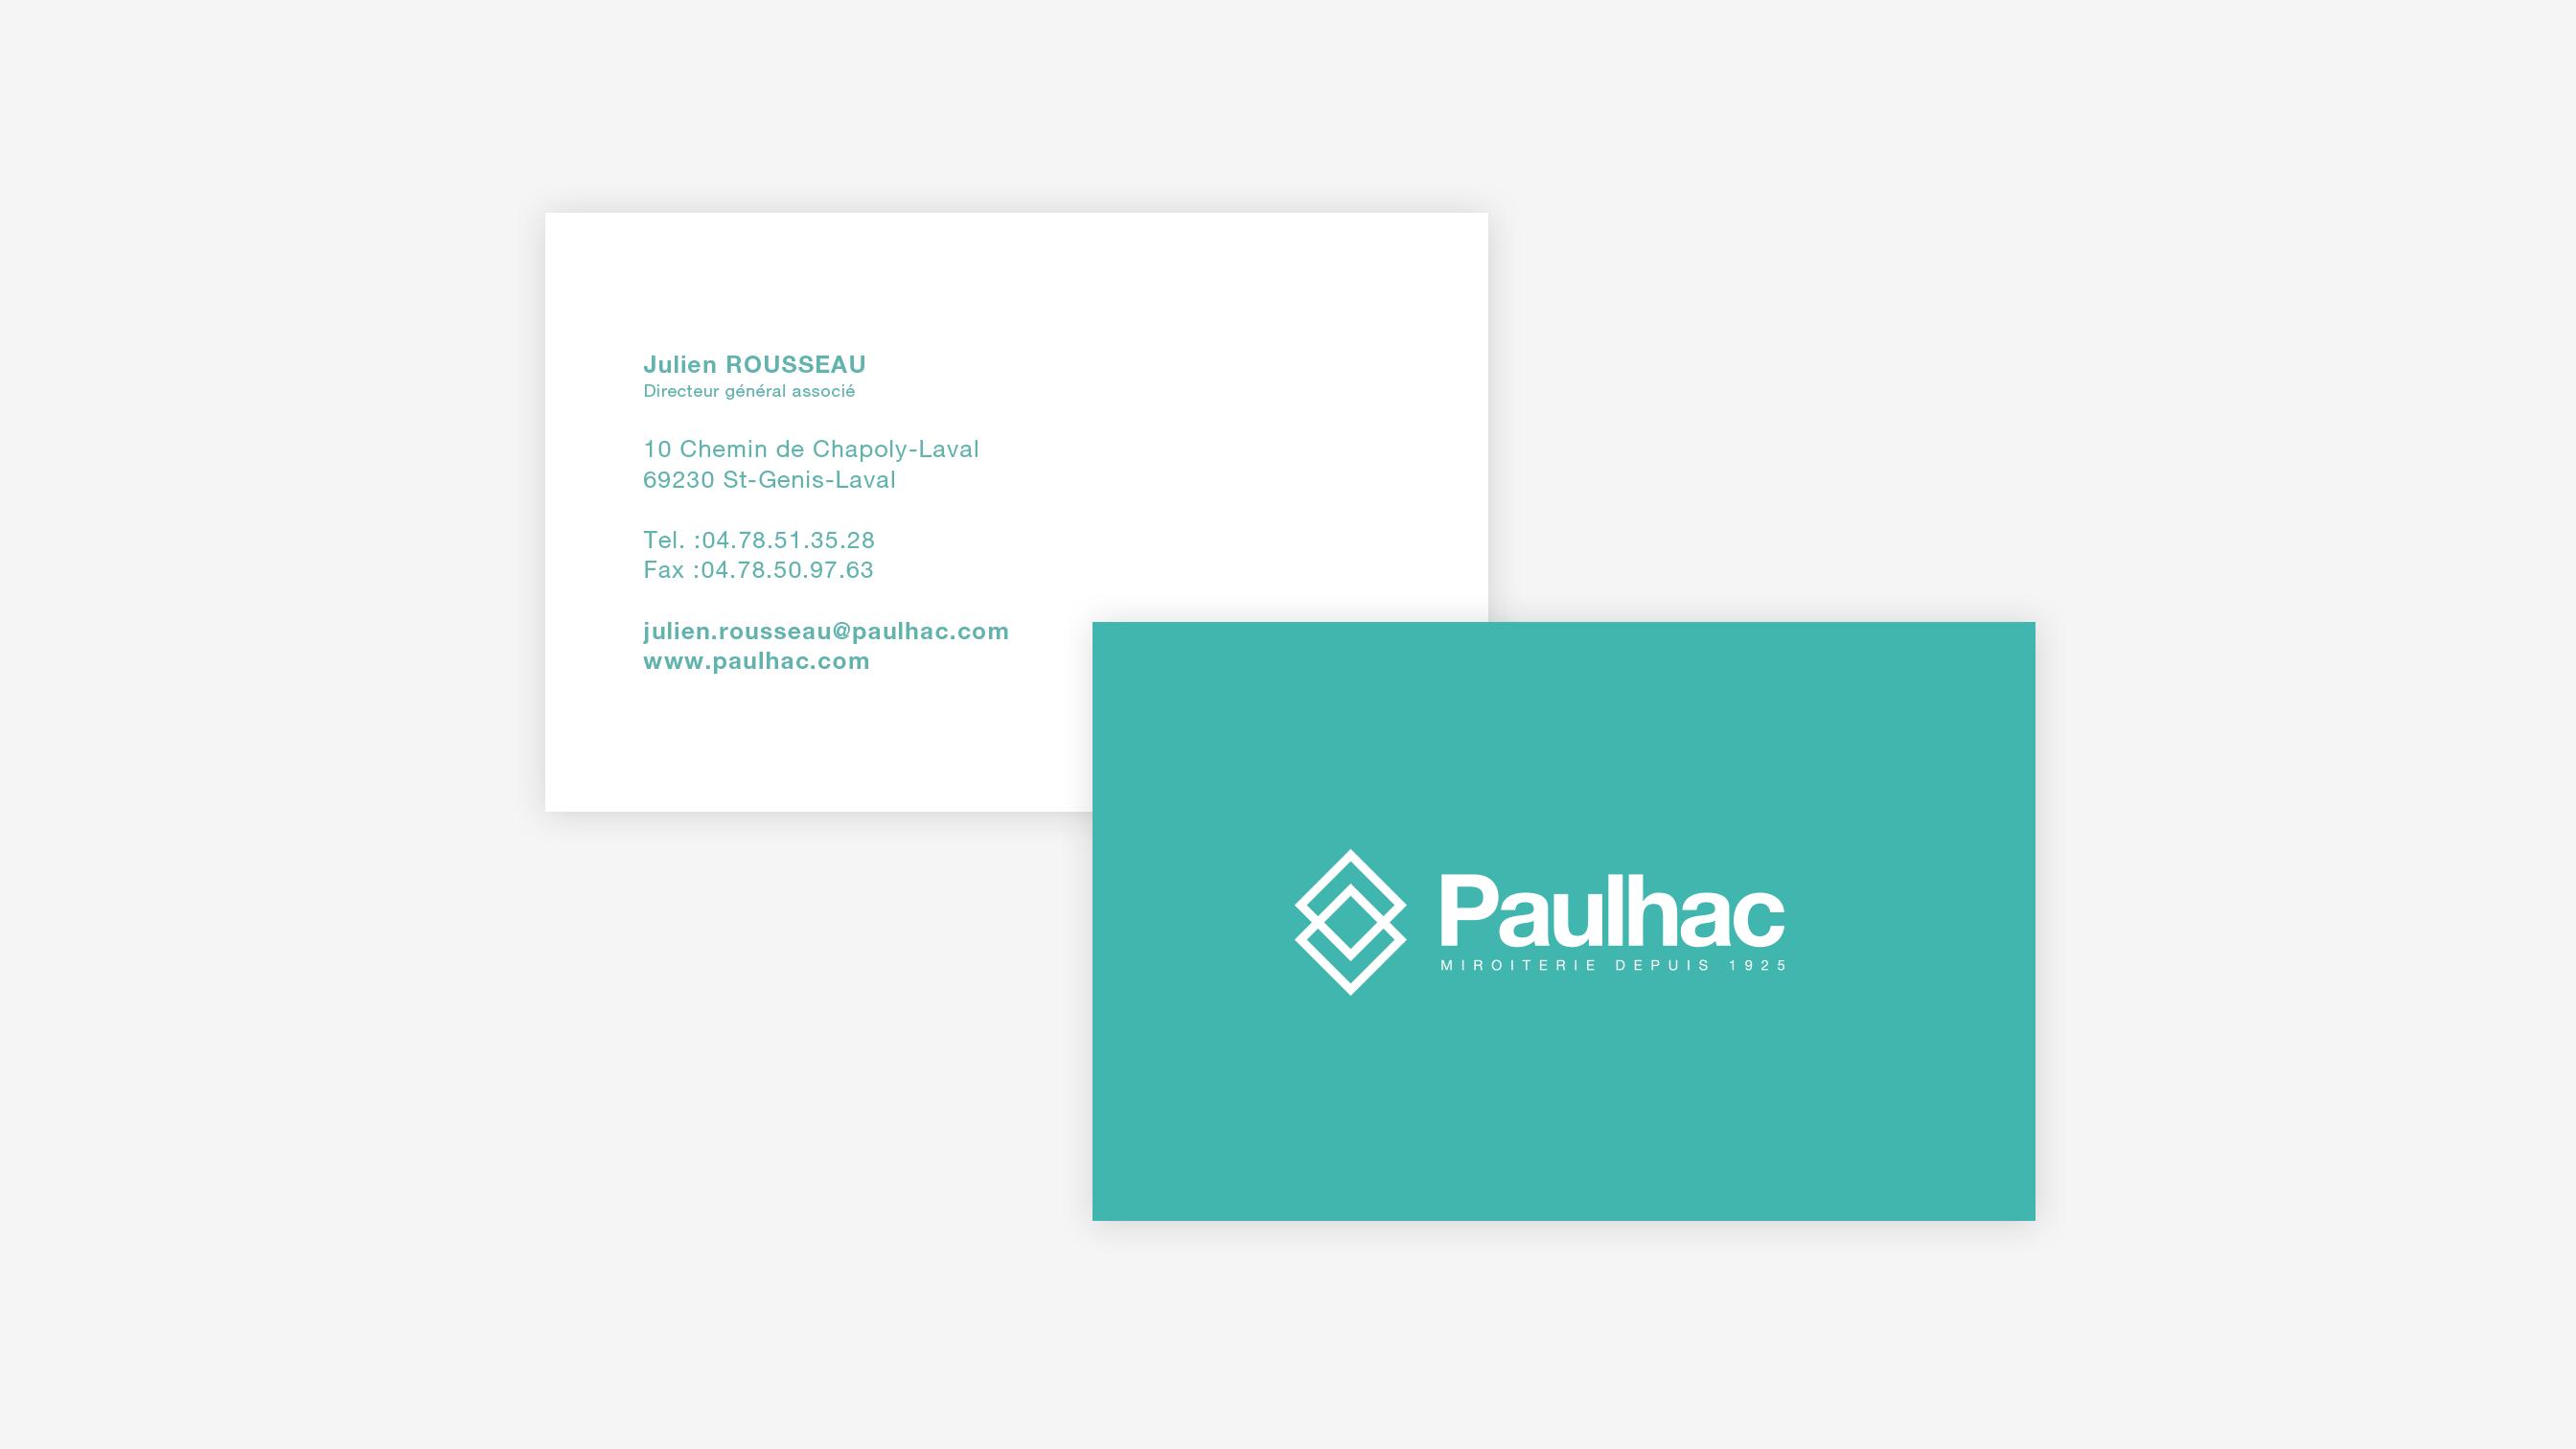 paulhac-01-cartes-pikteo